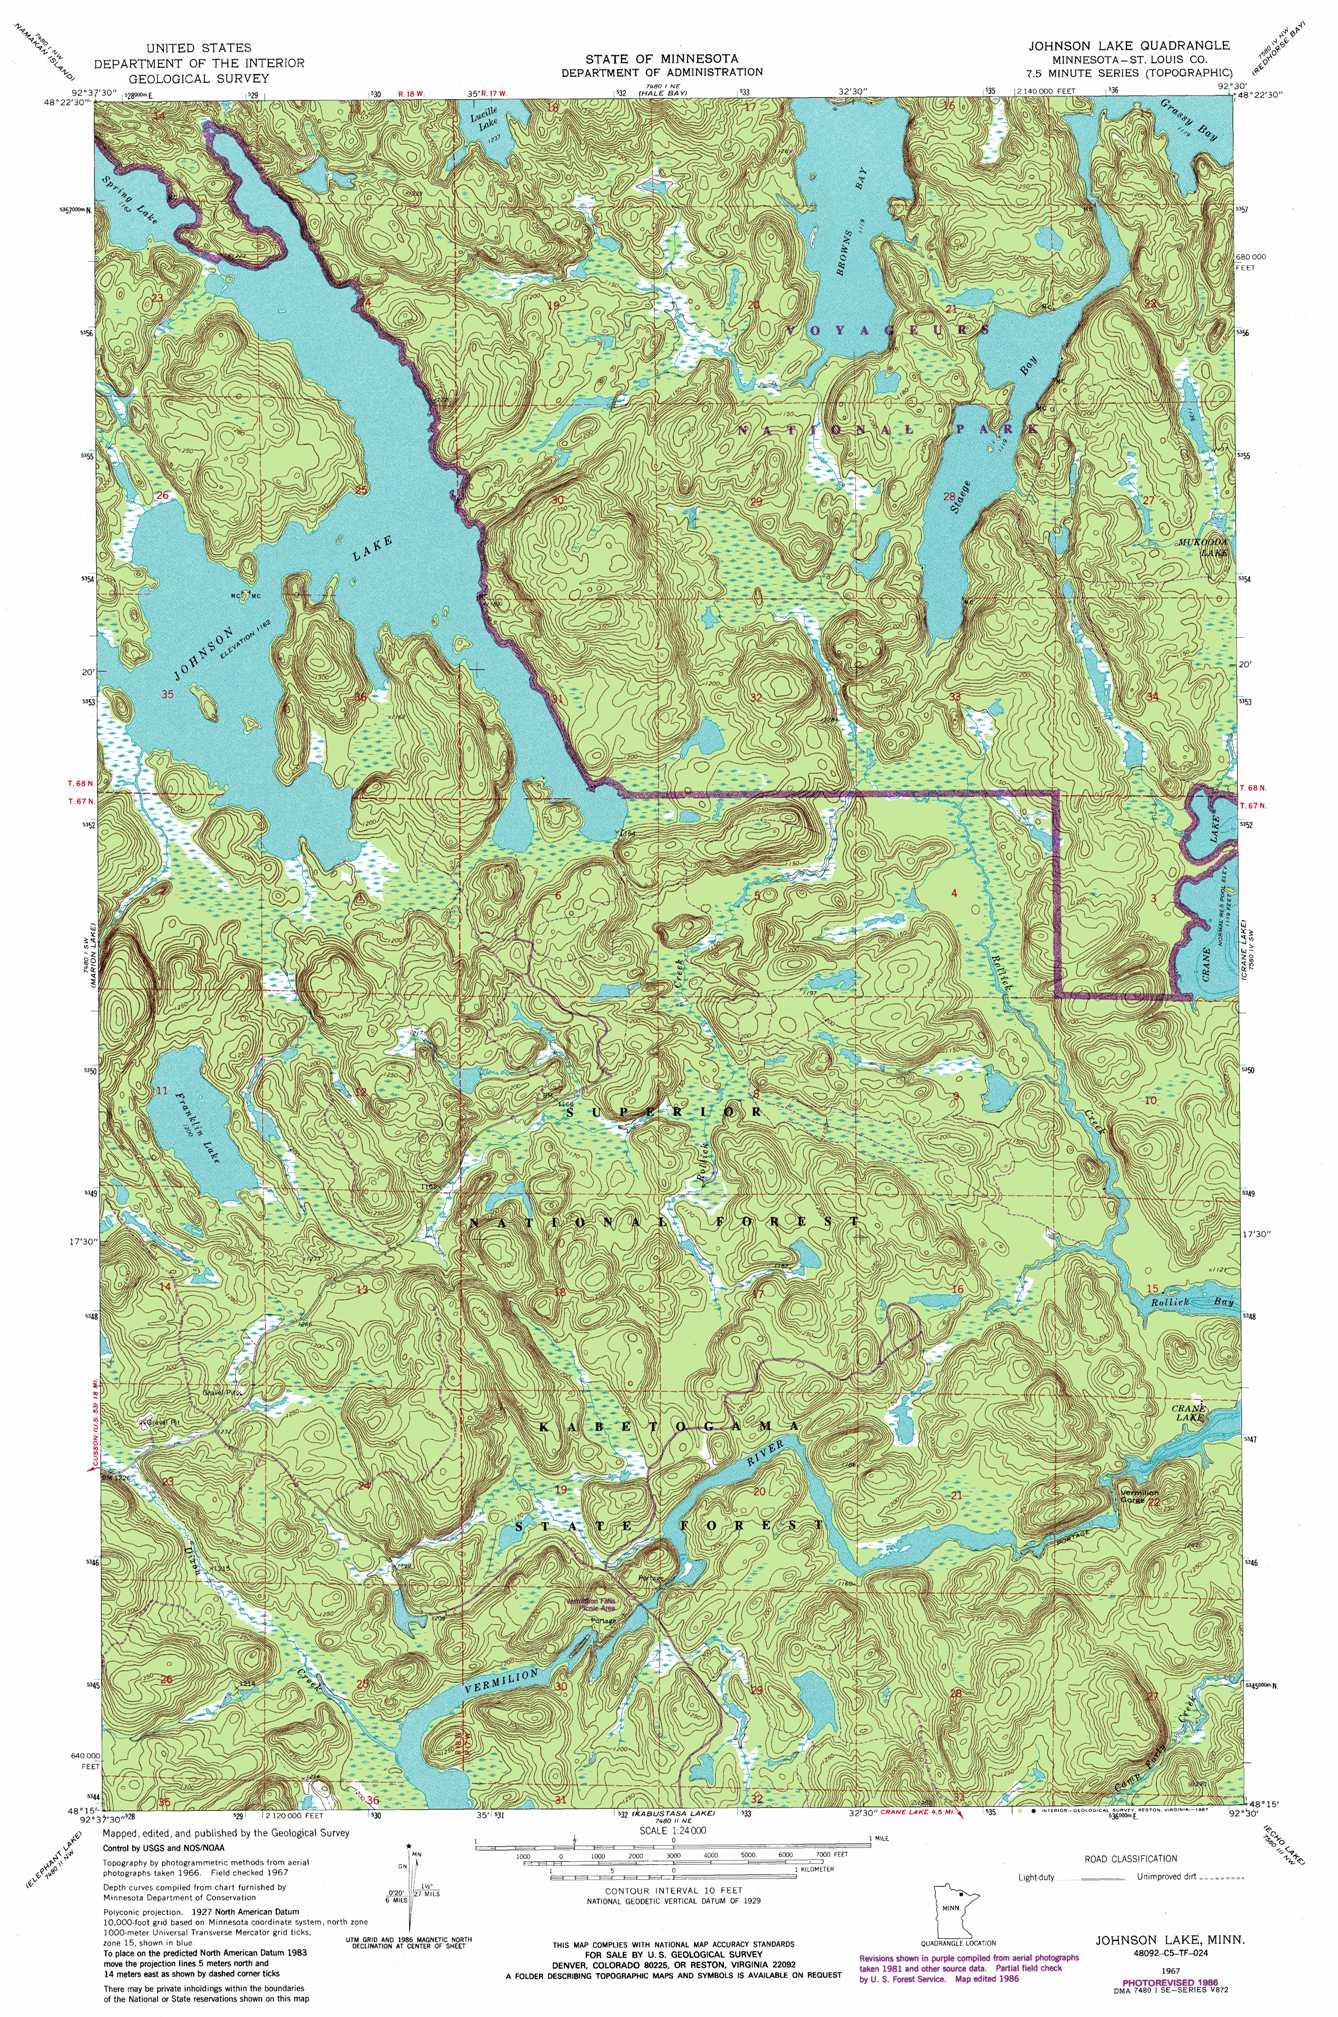 Johnson Lake Topographic Map MN USGS Topo Quad C - Johnson lake map